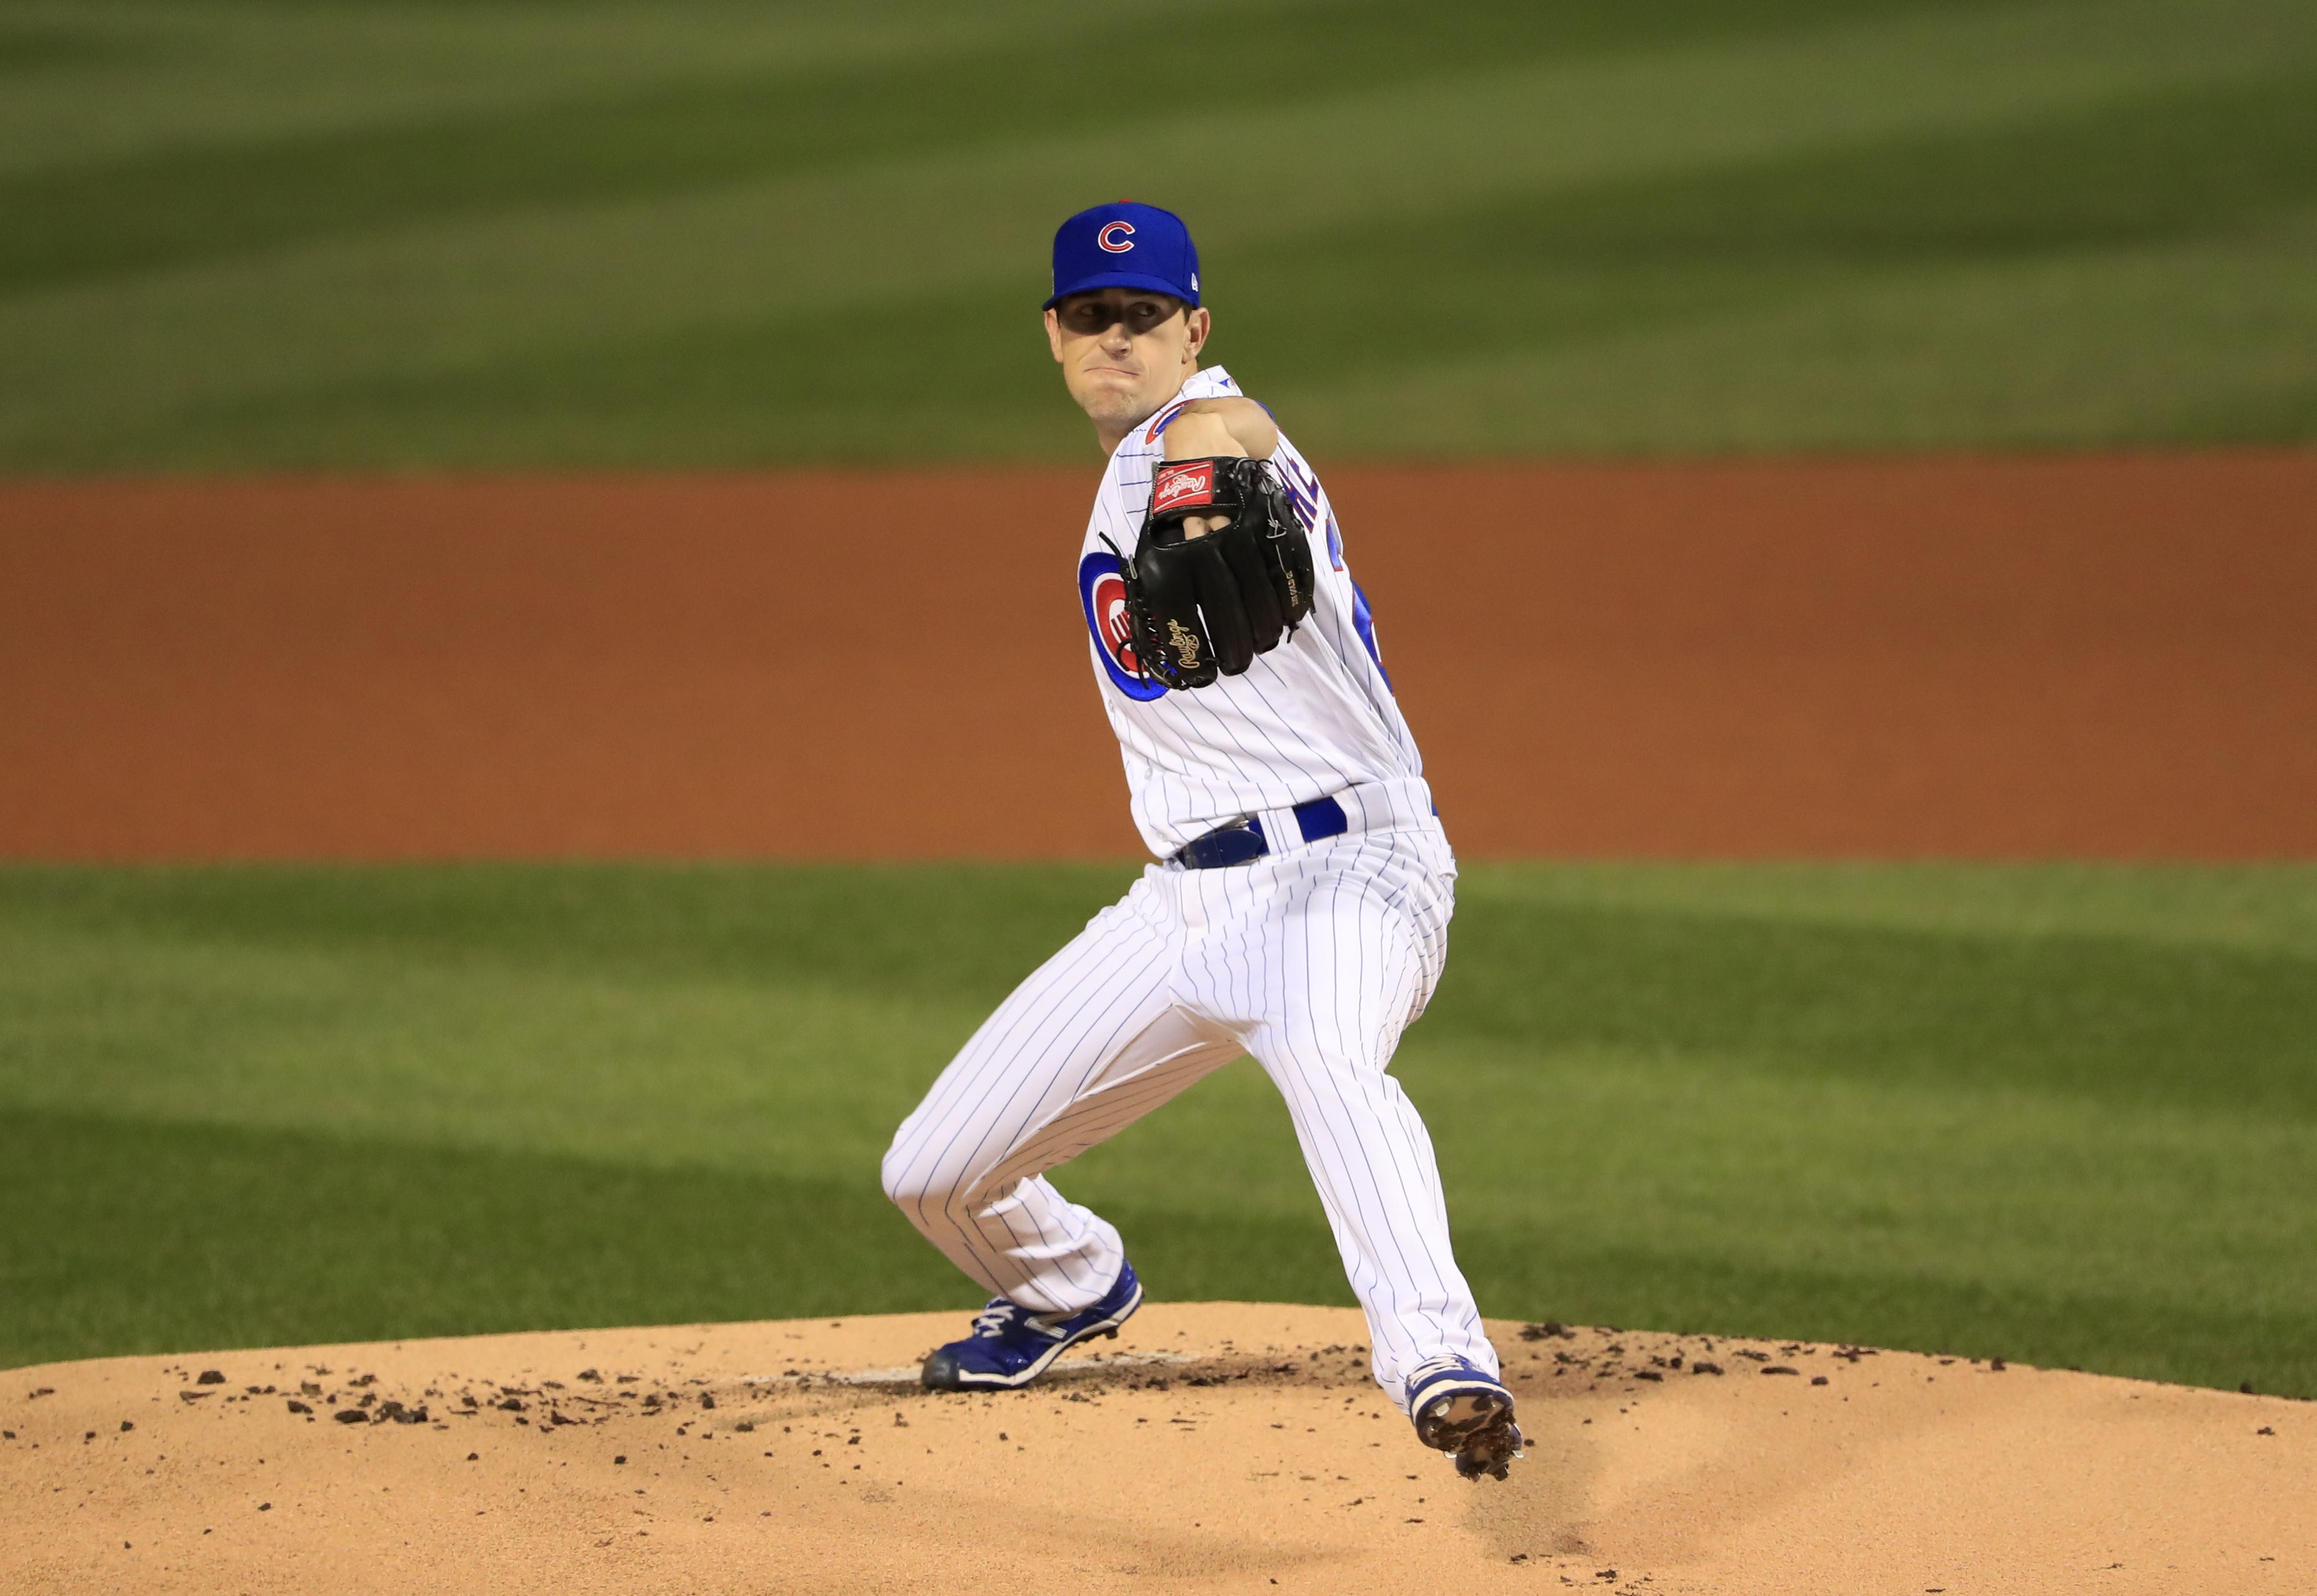 Cubs closer Aroldis Chapman '100 percent' ready for Game 7